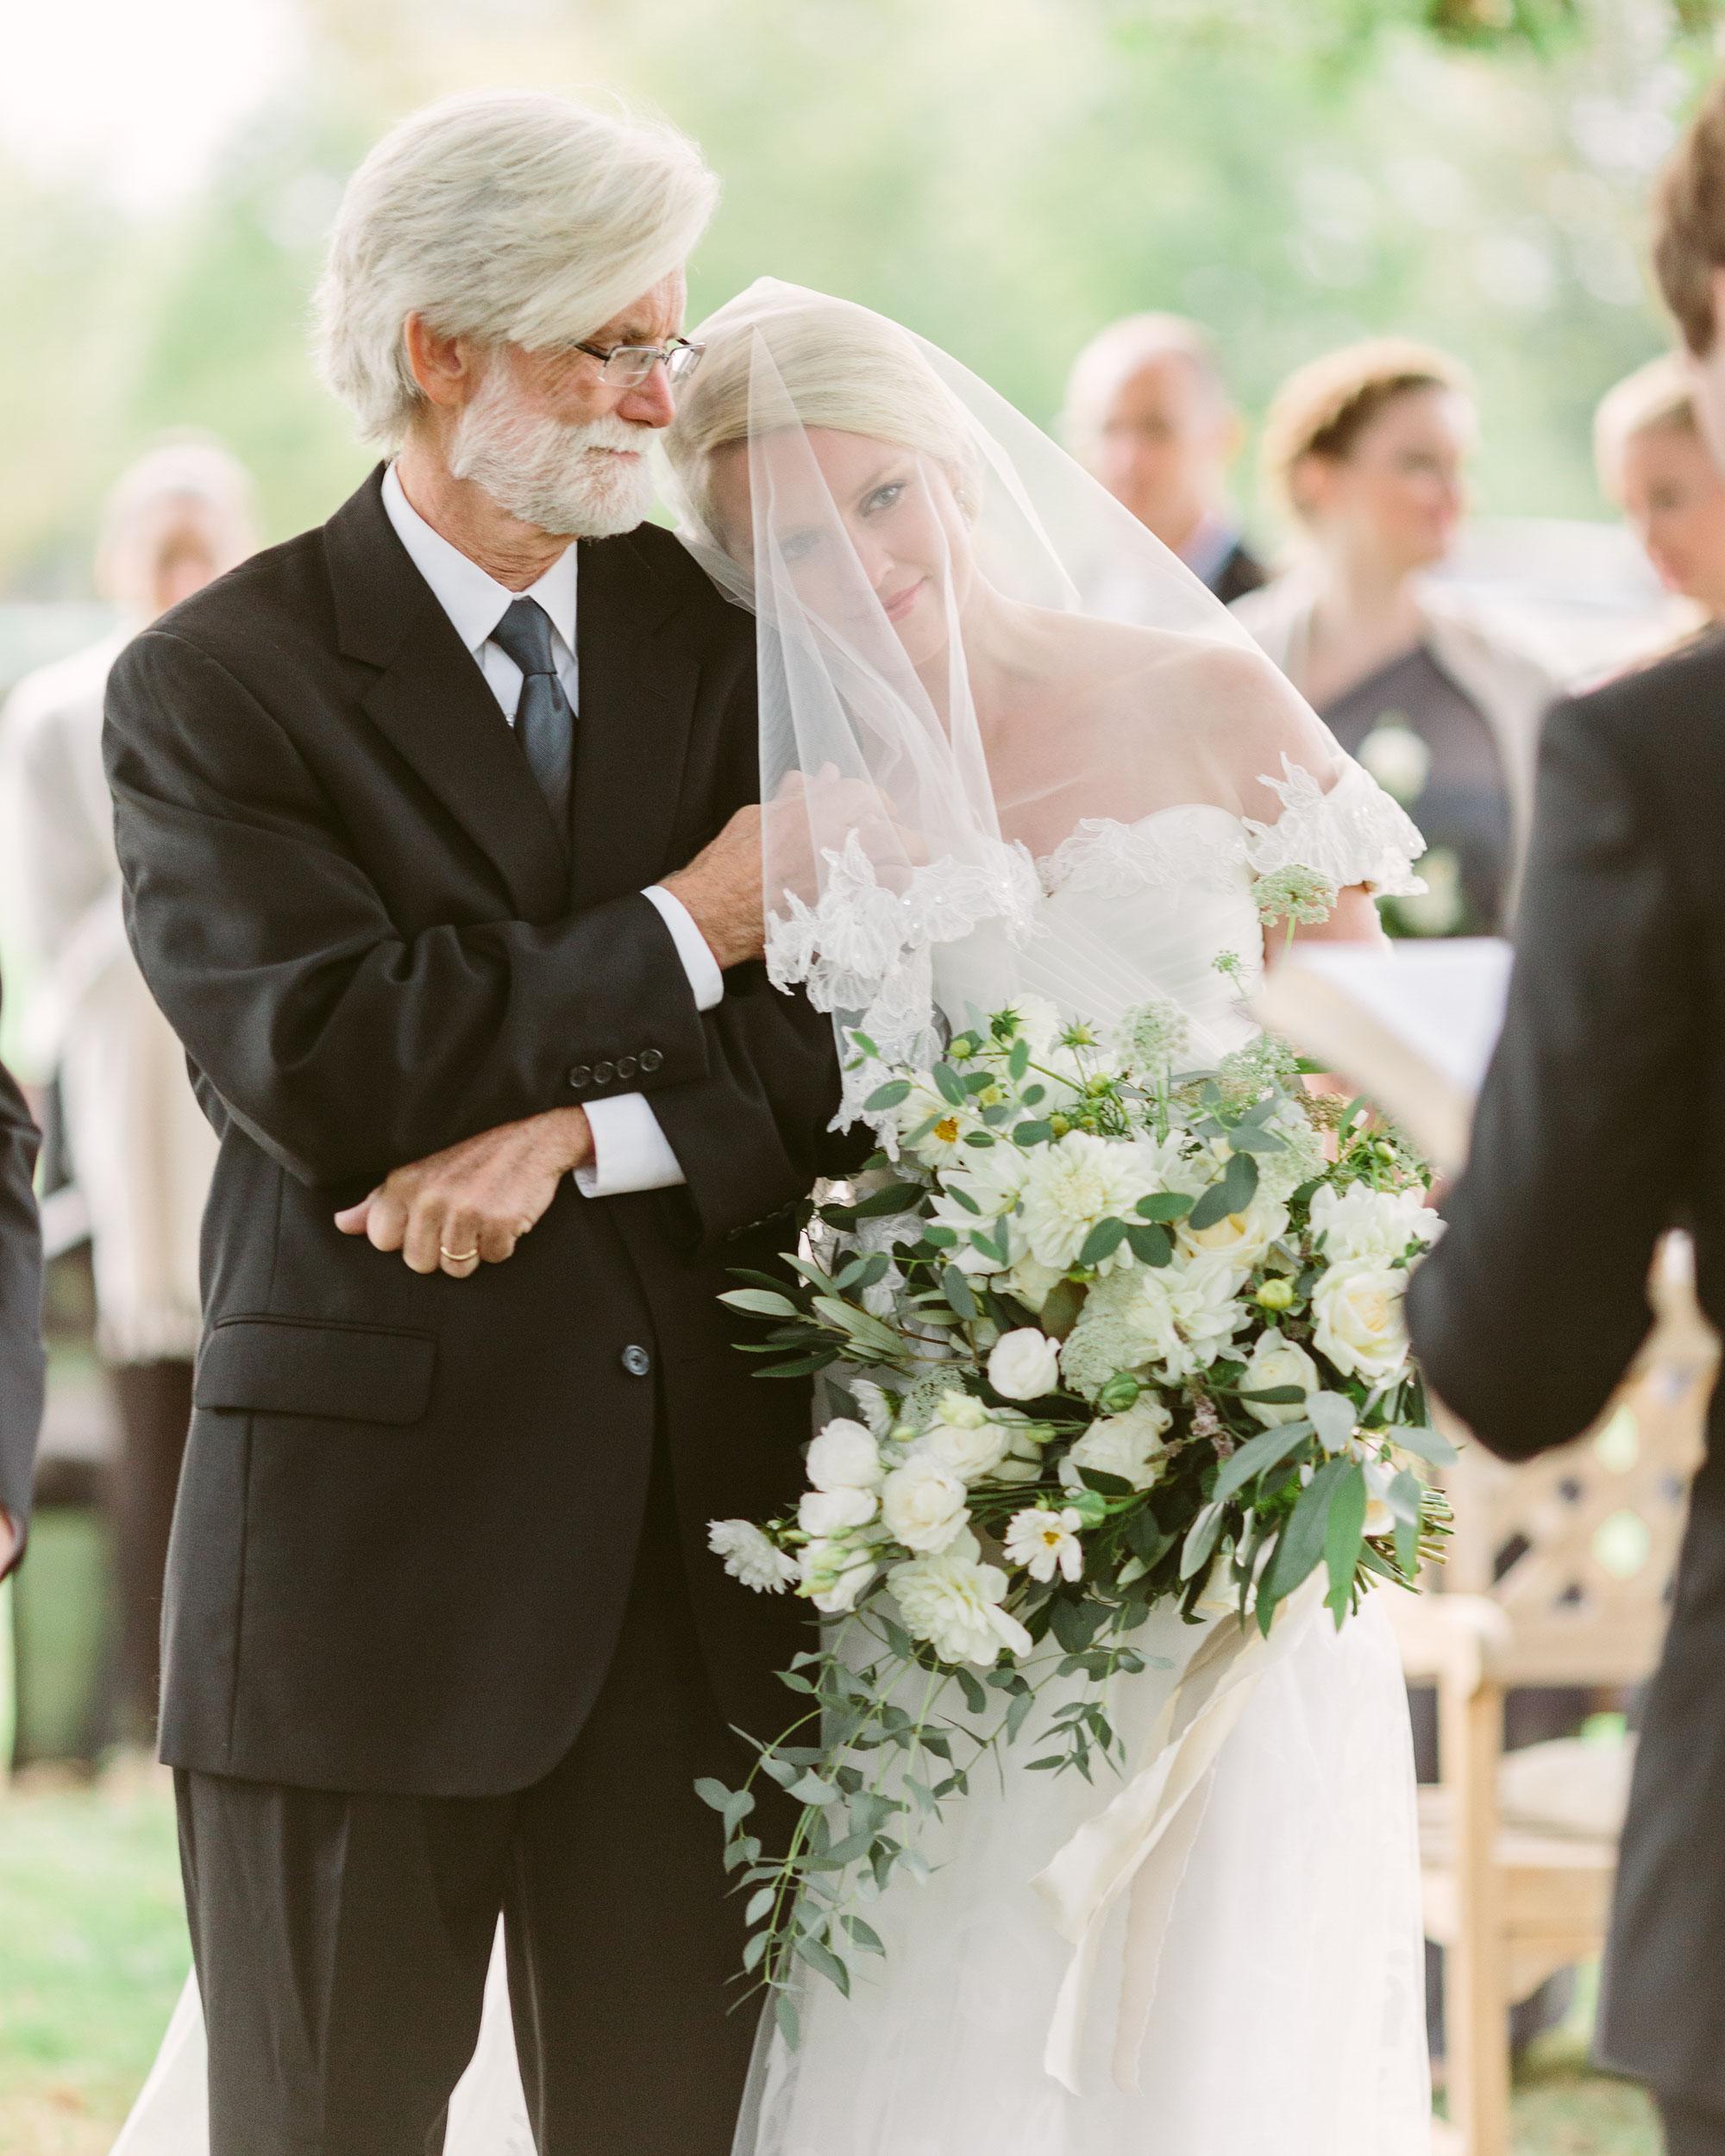 anneclaire-chris-wedding-france-dad-029-s113034-00716.jpg